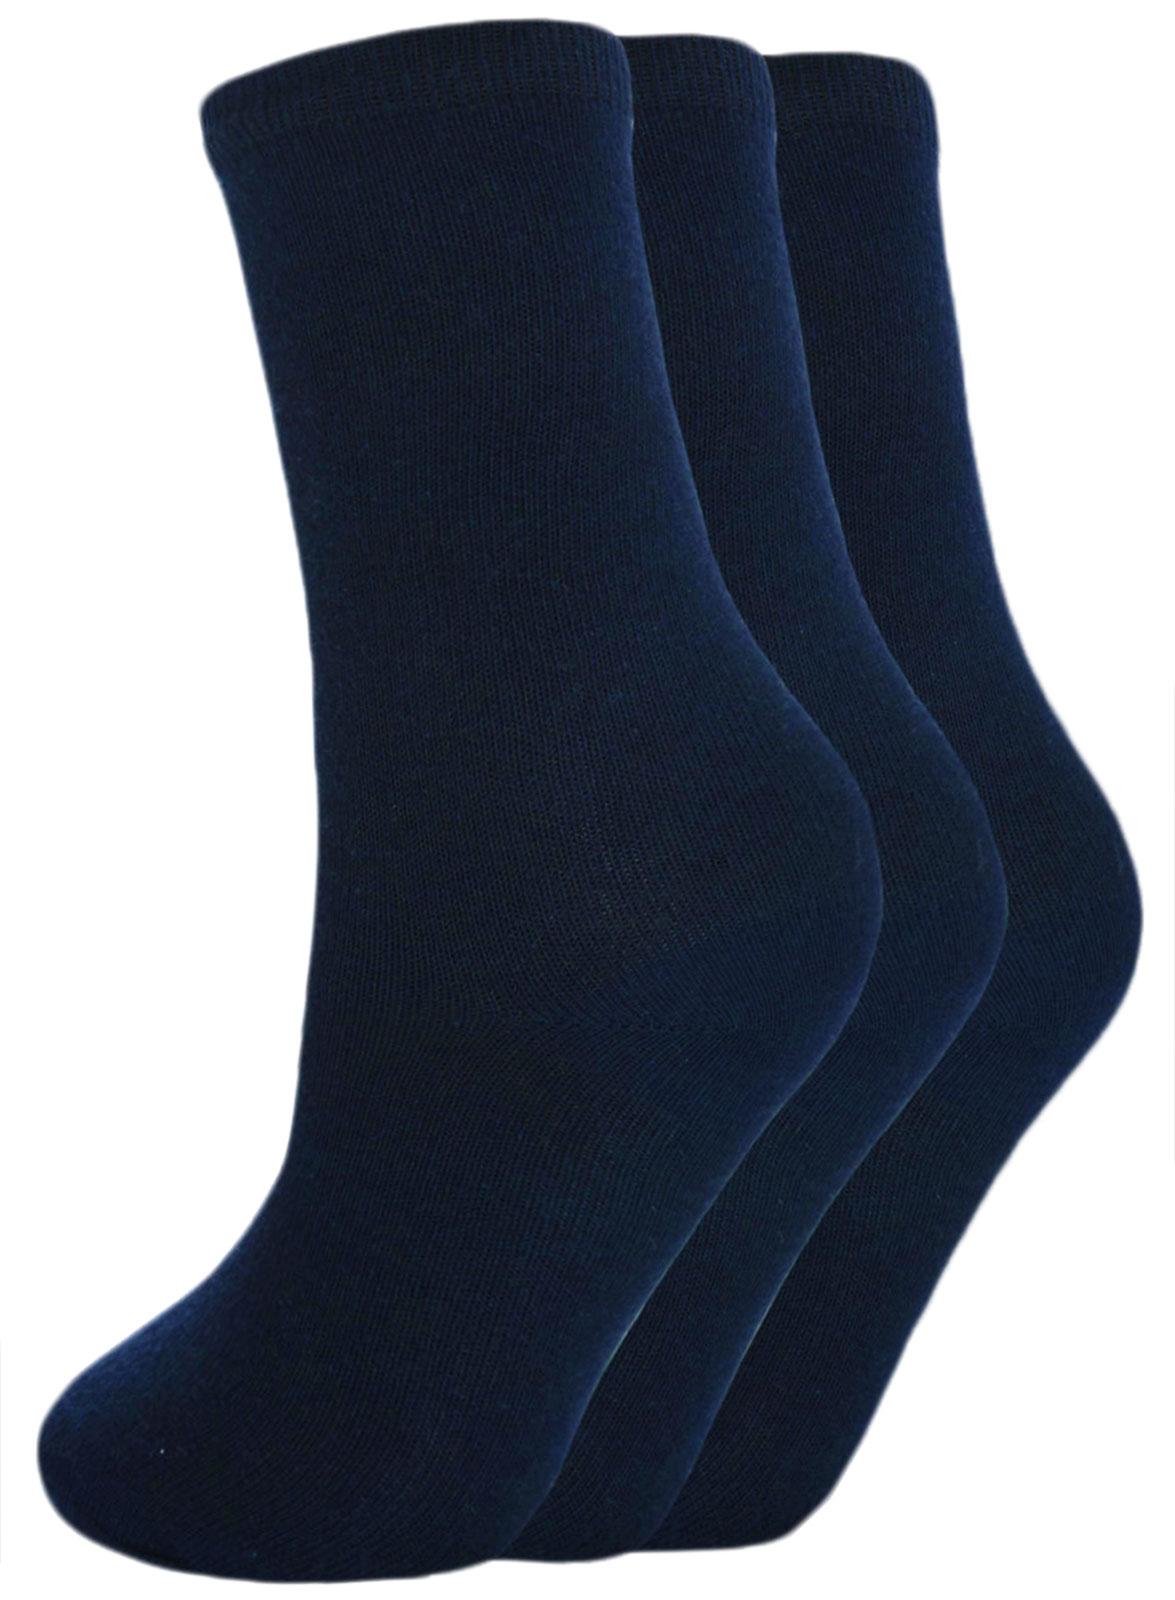 Boys Ankle Socks 3 Pairs Plain Cotton School Trainer Sport Socks Black Grey Navy